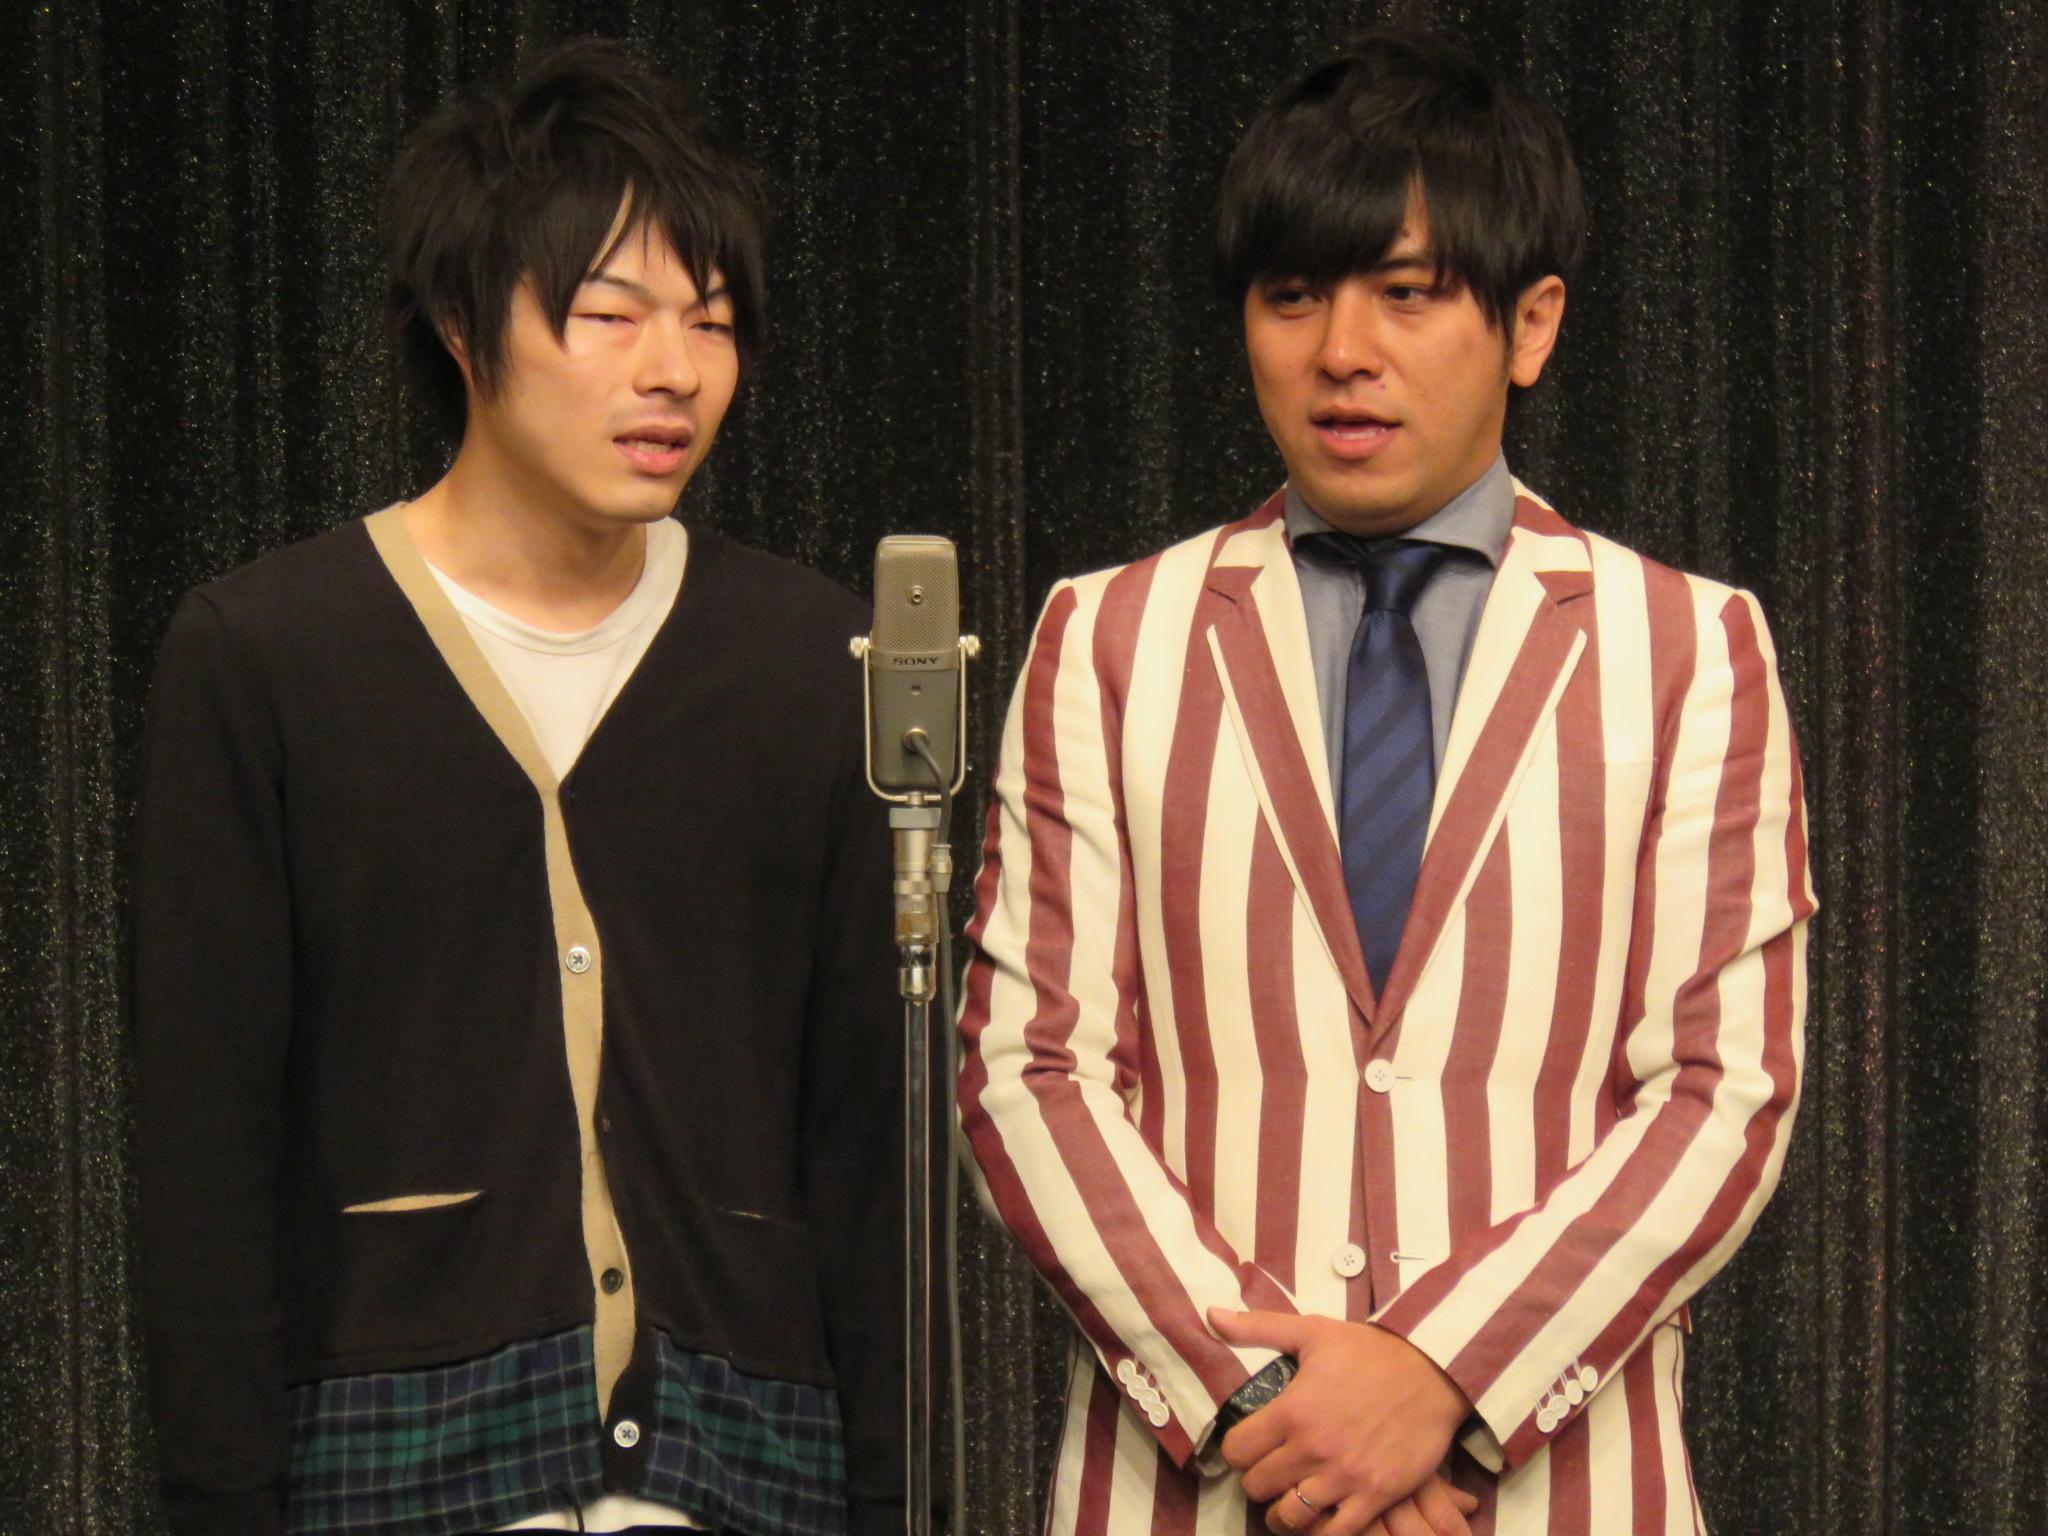 http://news.yoshimoto.co.jp/20151230165313-28f89f1d4a75a11e303adbd24e9cae56cbadda5c.jpg